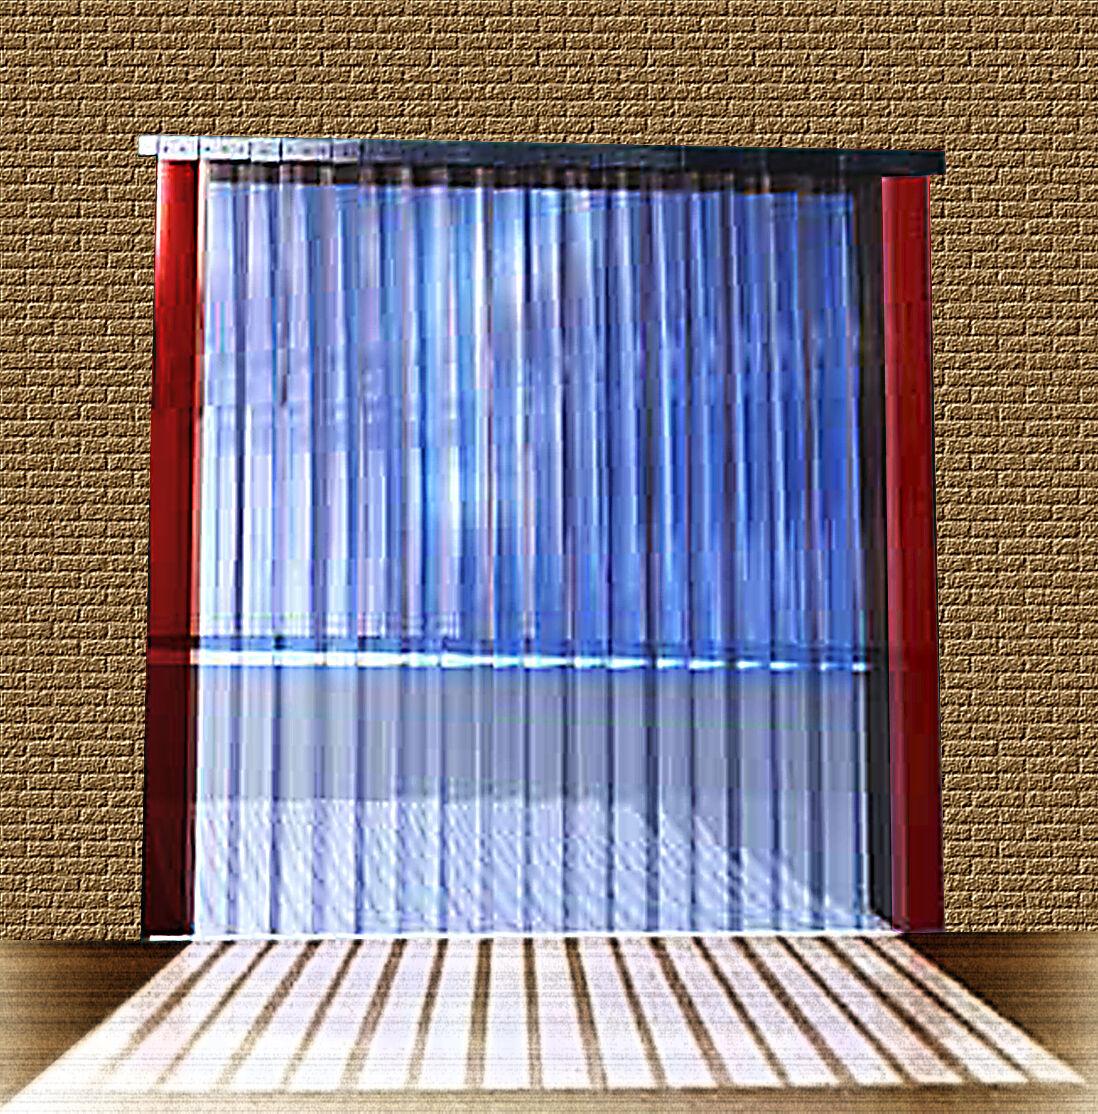 B 1,50m x H1,75m Lamellen PVC Streifen Vorhang 300x3mm